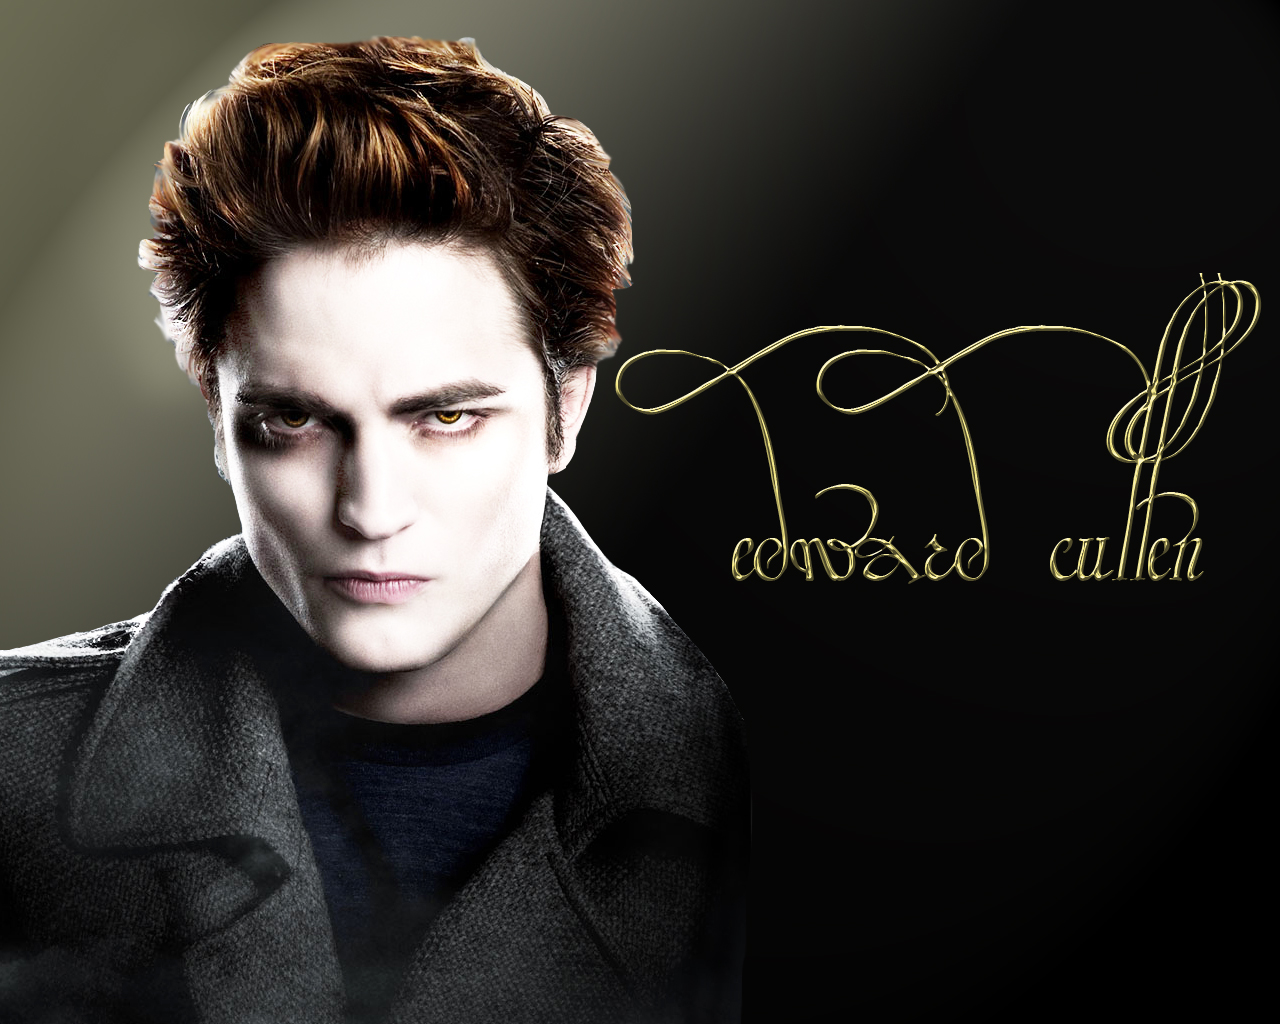 Download Popular Wallpapers 5 Stars: Robert Pattinson 2012